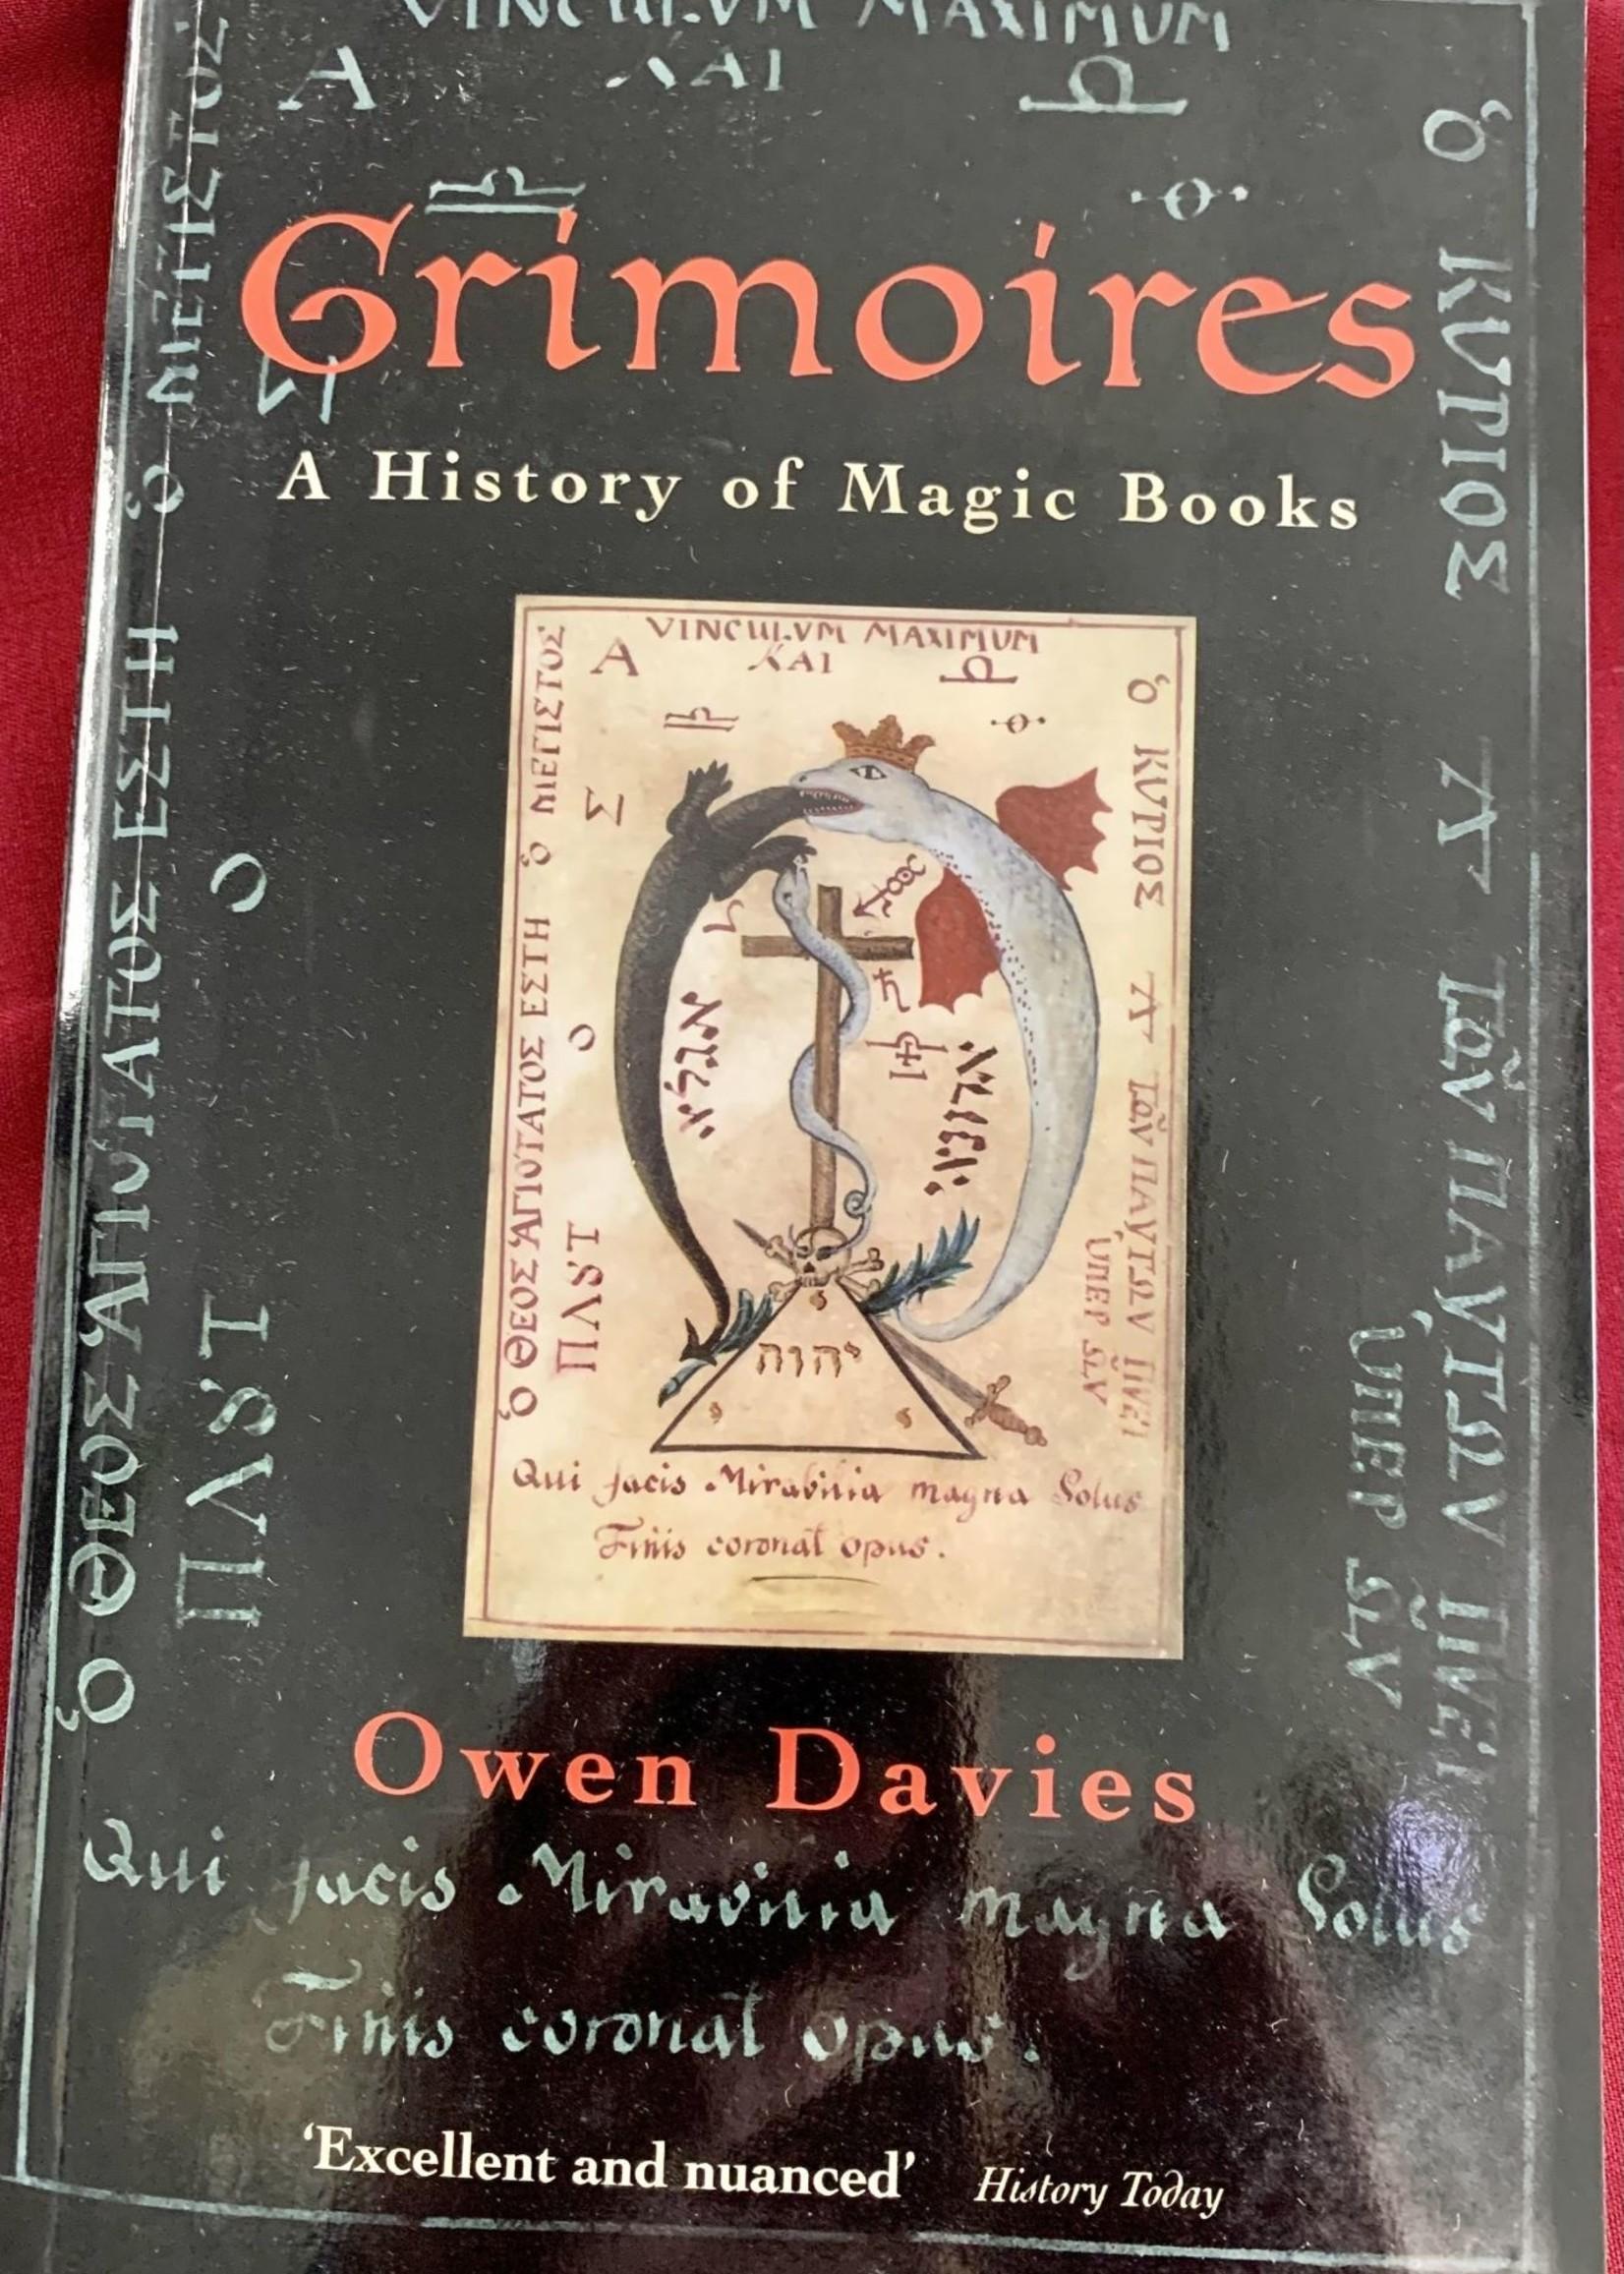 Grimoires A History of Magic Books - Owen Davies